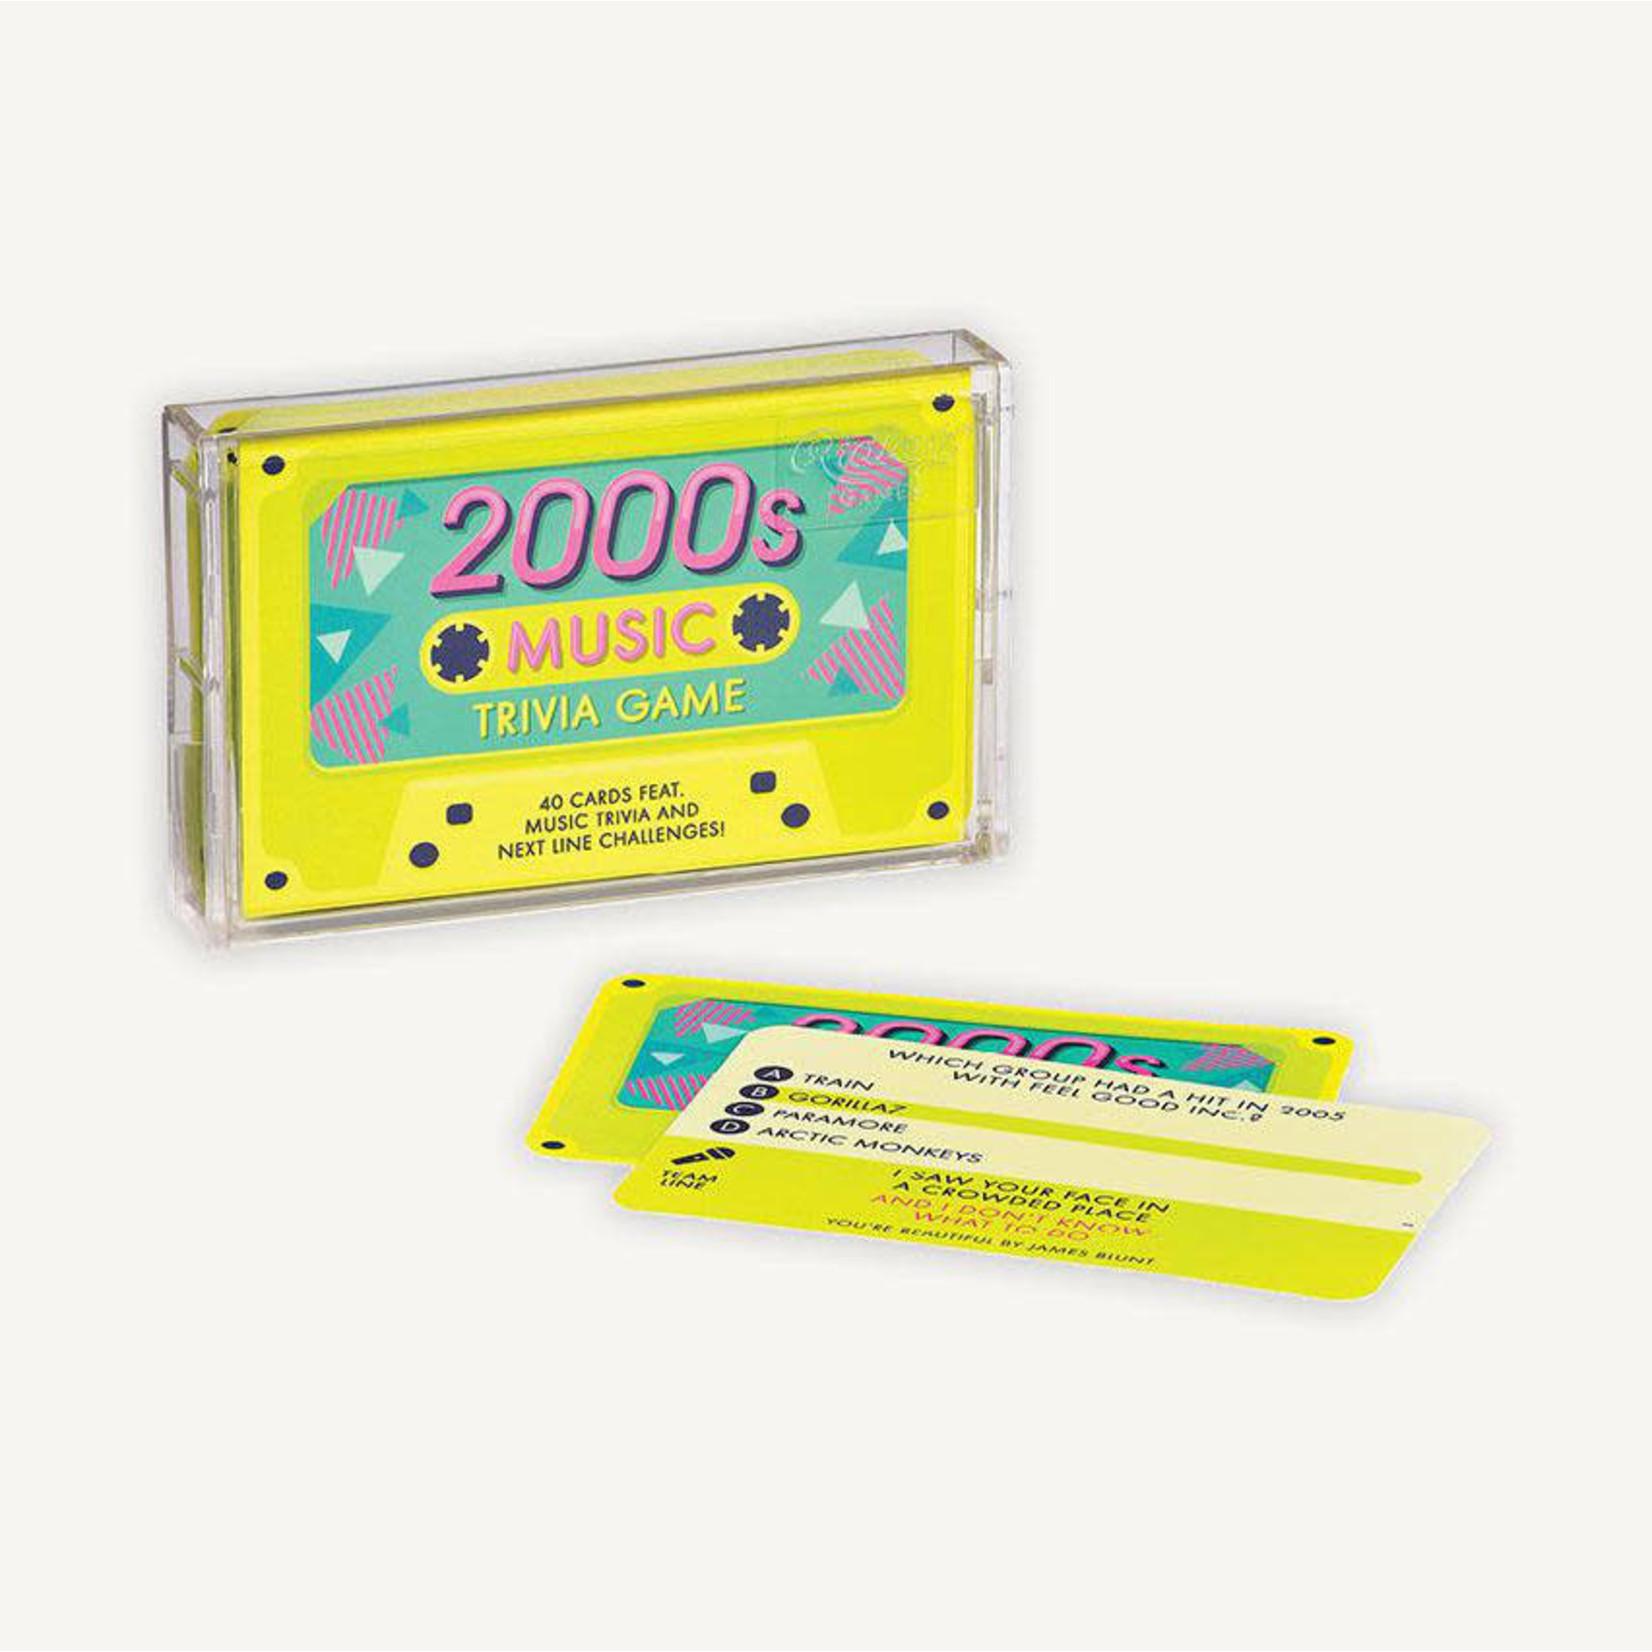 CHRONICLE 2000s MUSIC TRIVIA GAME